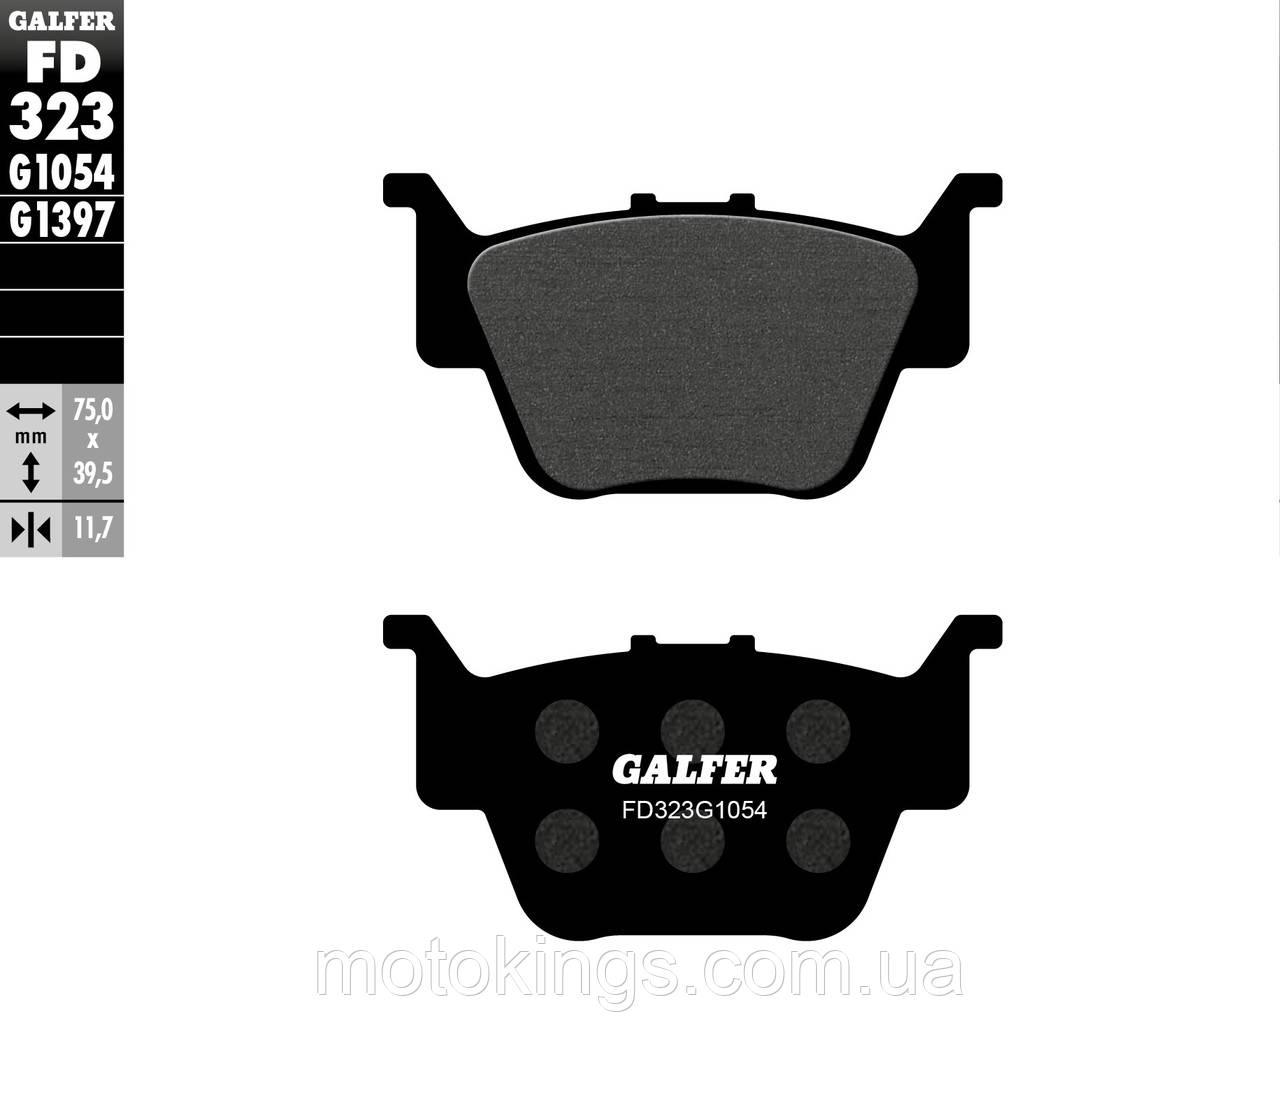 GALFER ТОРМОЗНЫЕ КОЛОДКИ    KH373 ATV (FD323G1054)